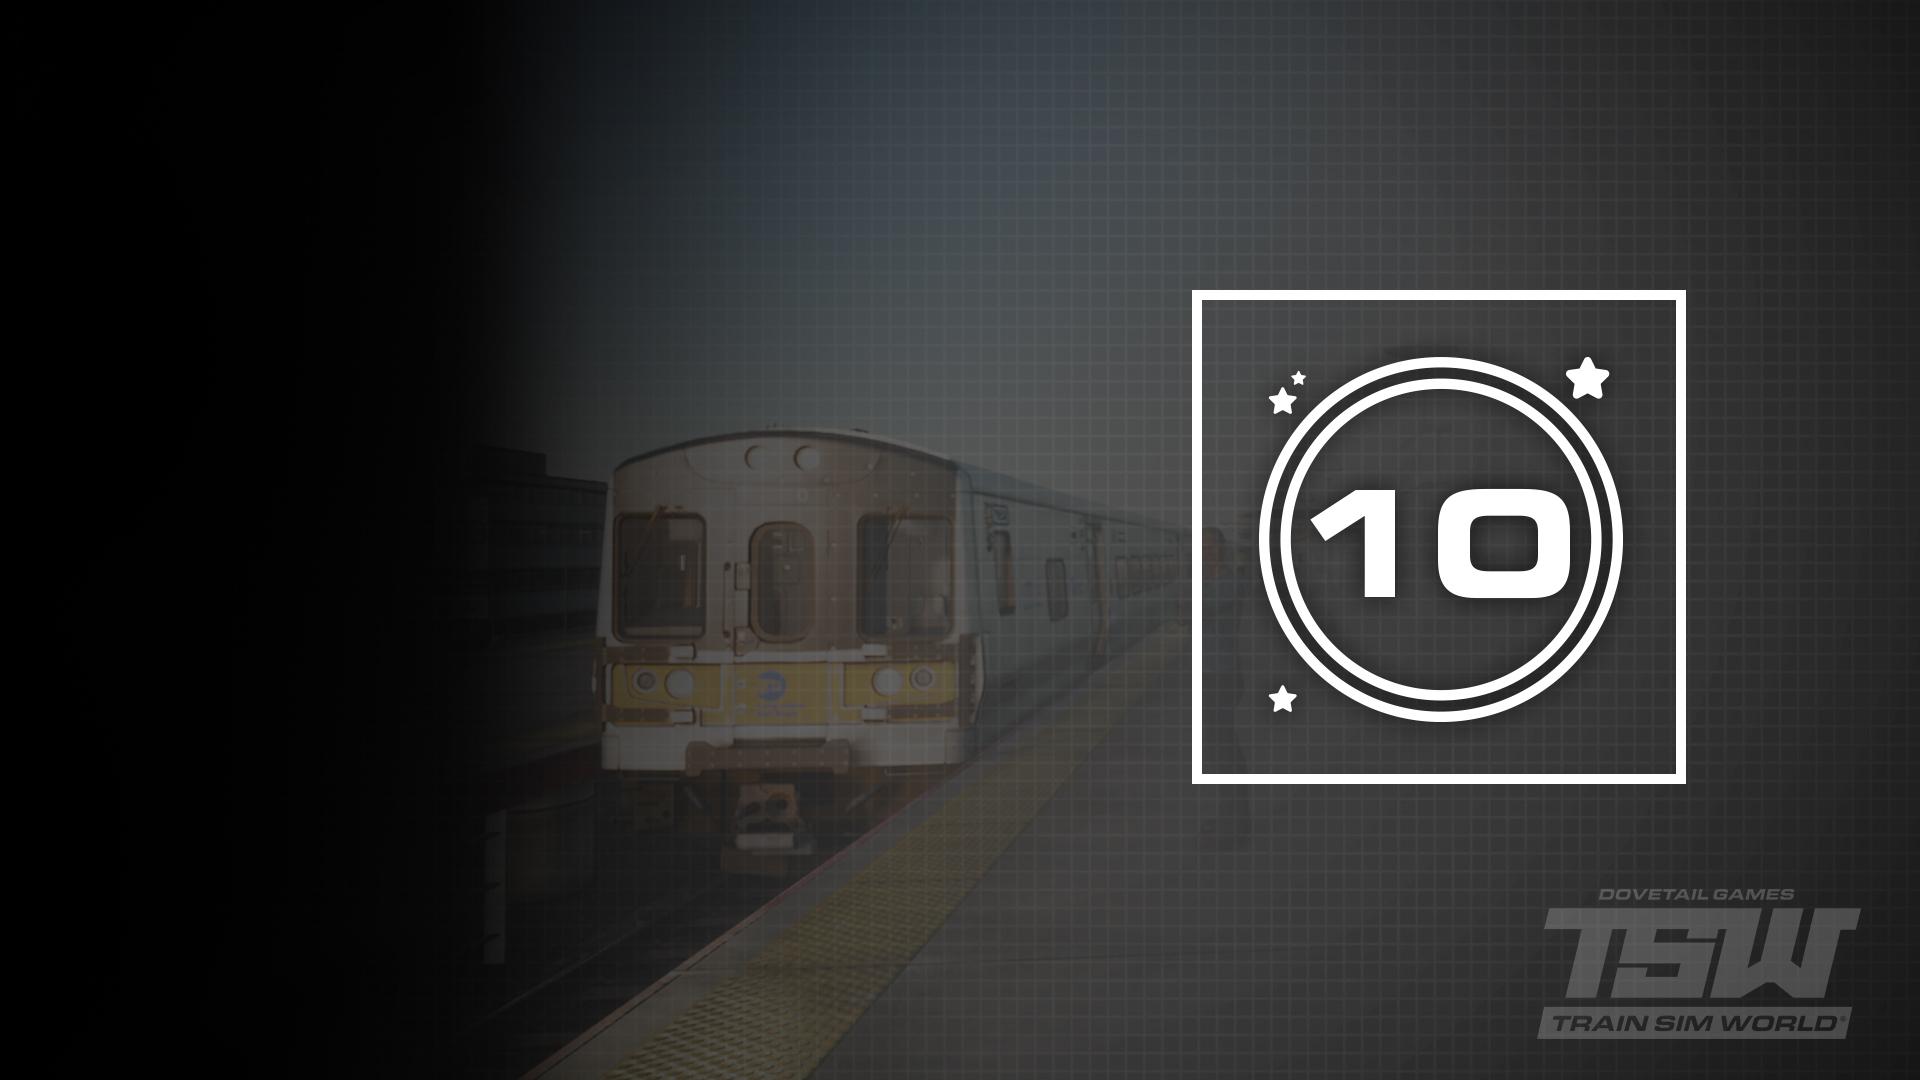 M7: Seven Up achievement for Train Sim World: CSX Heavy Haul on Xbox One